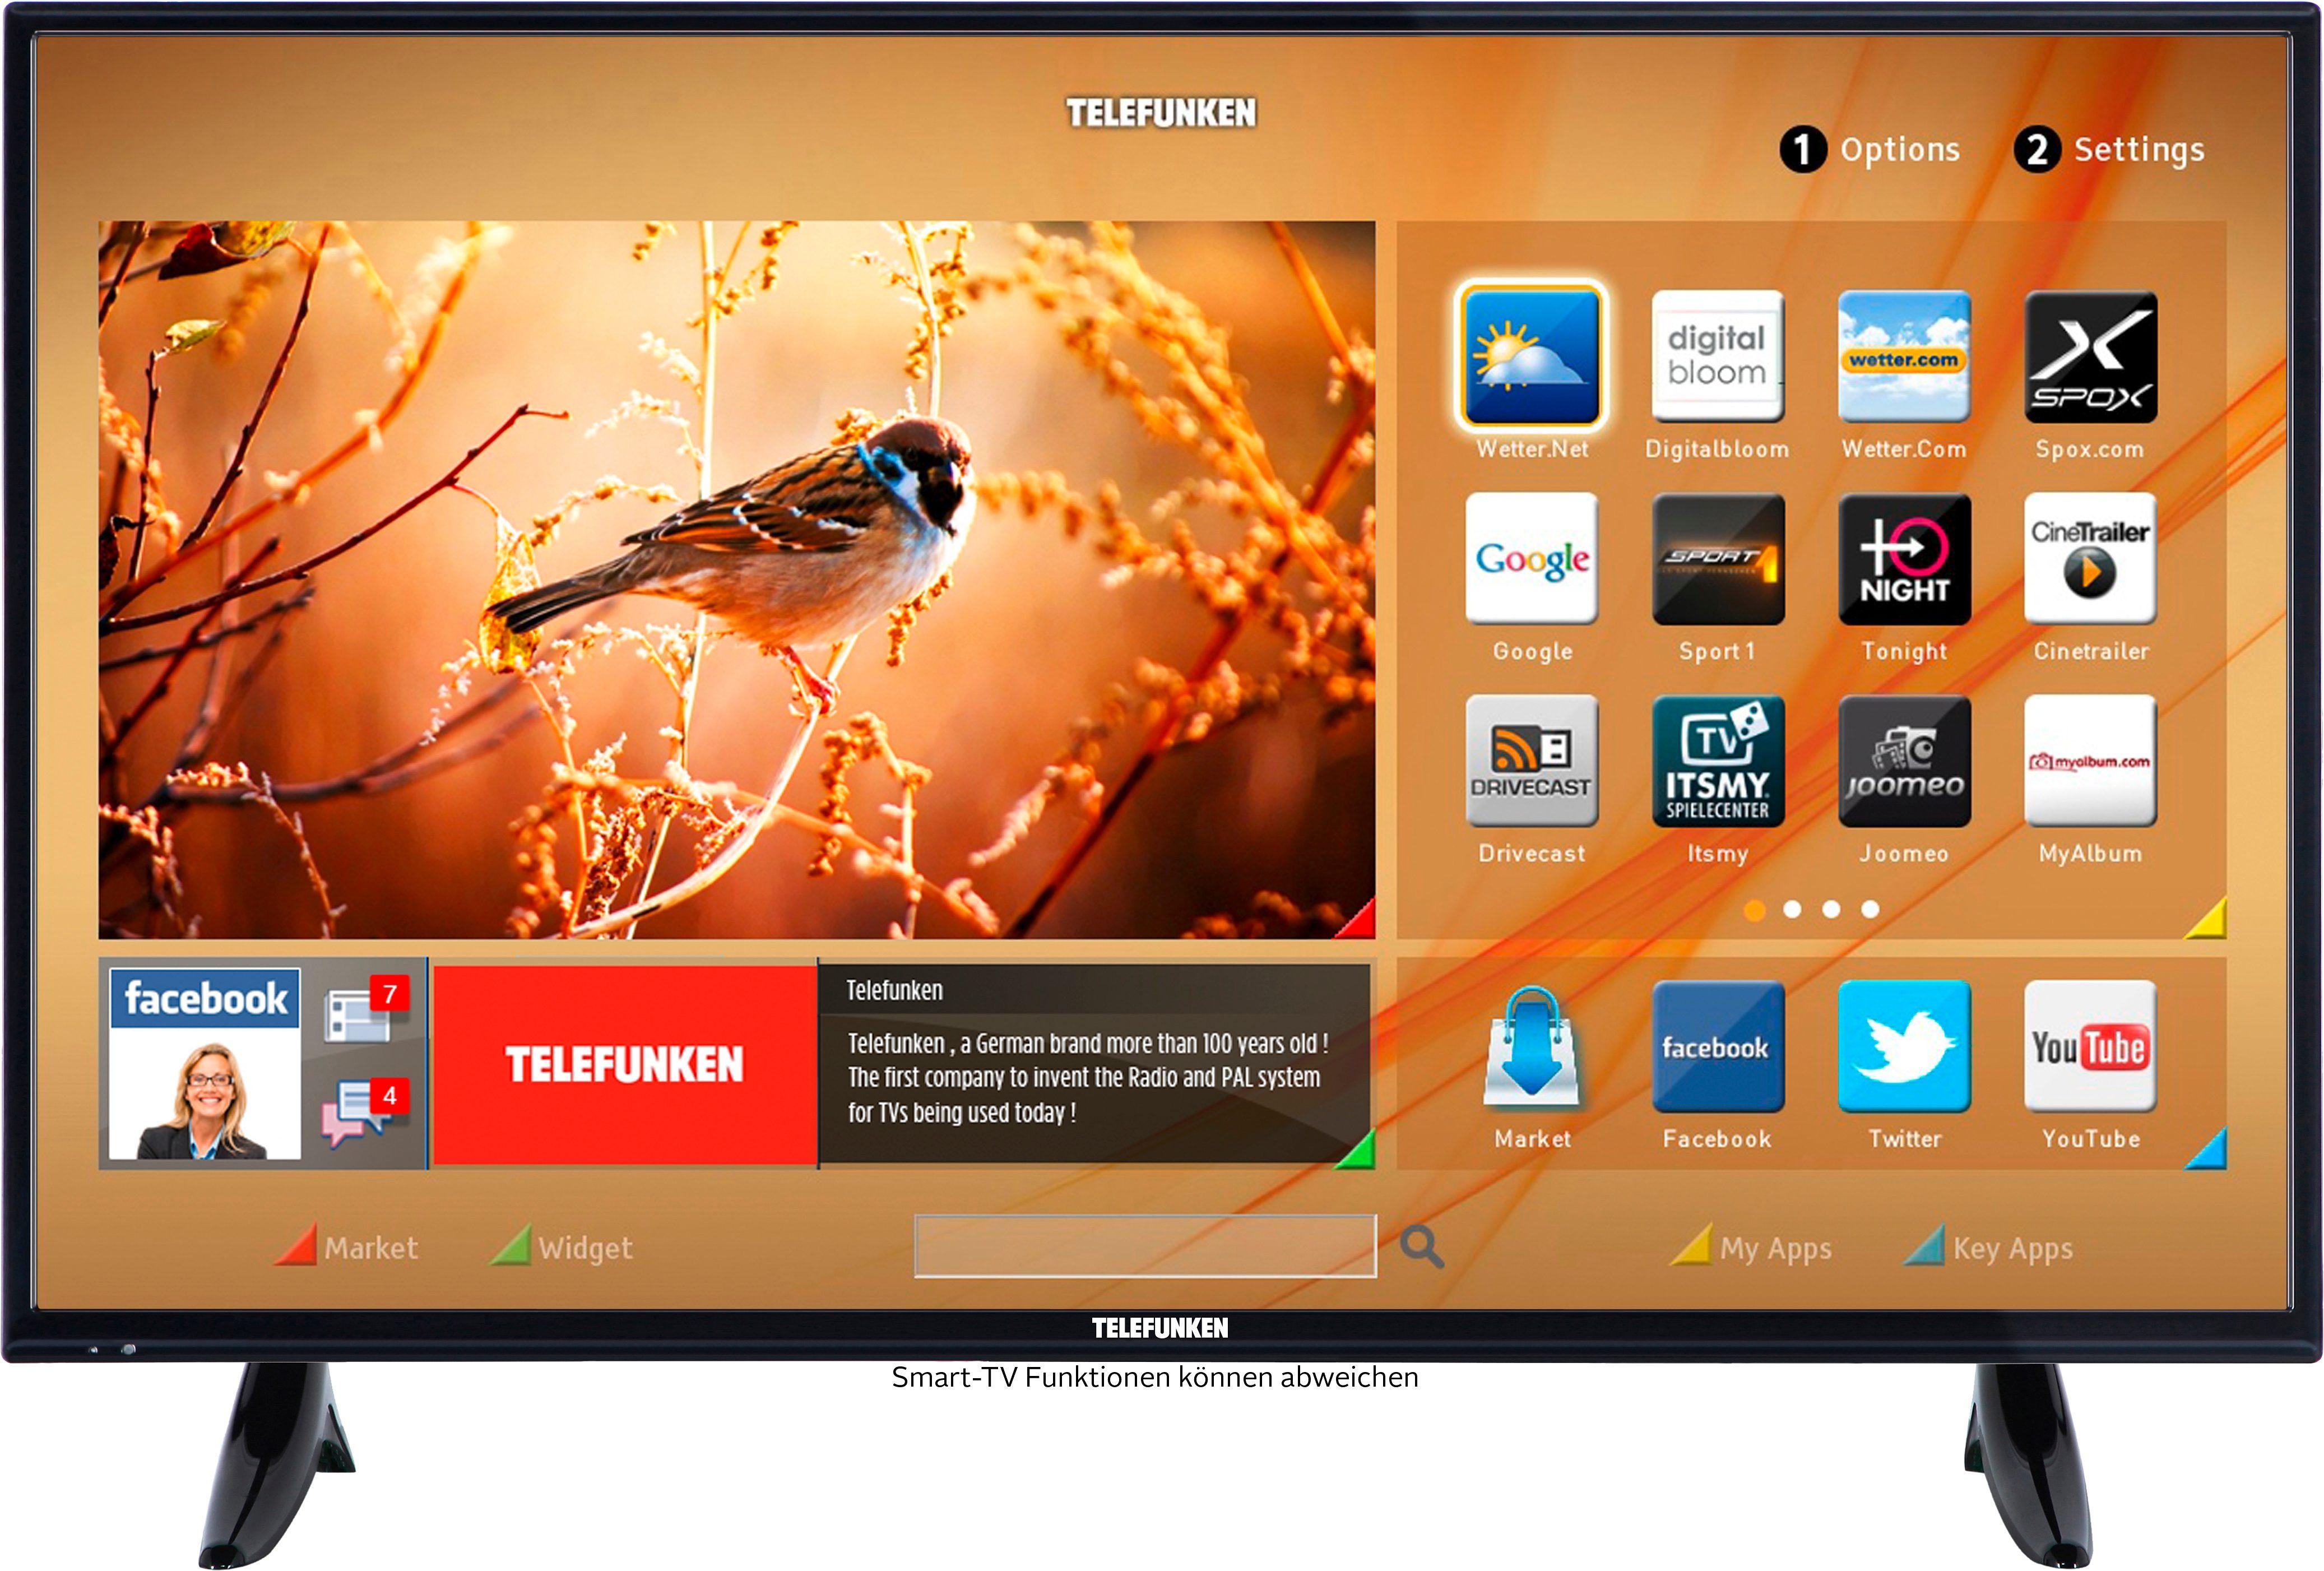 Telefunken D40F287M3CW, LED Fernseher, 102 cm (40 Zoll), 1080p (Full HD), Smart-TV